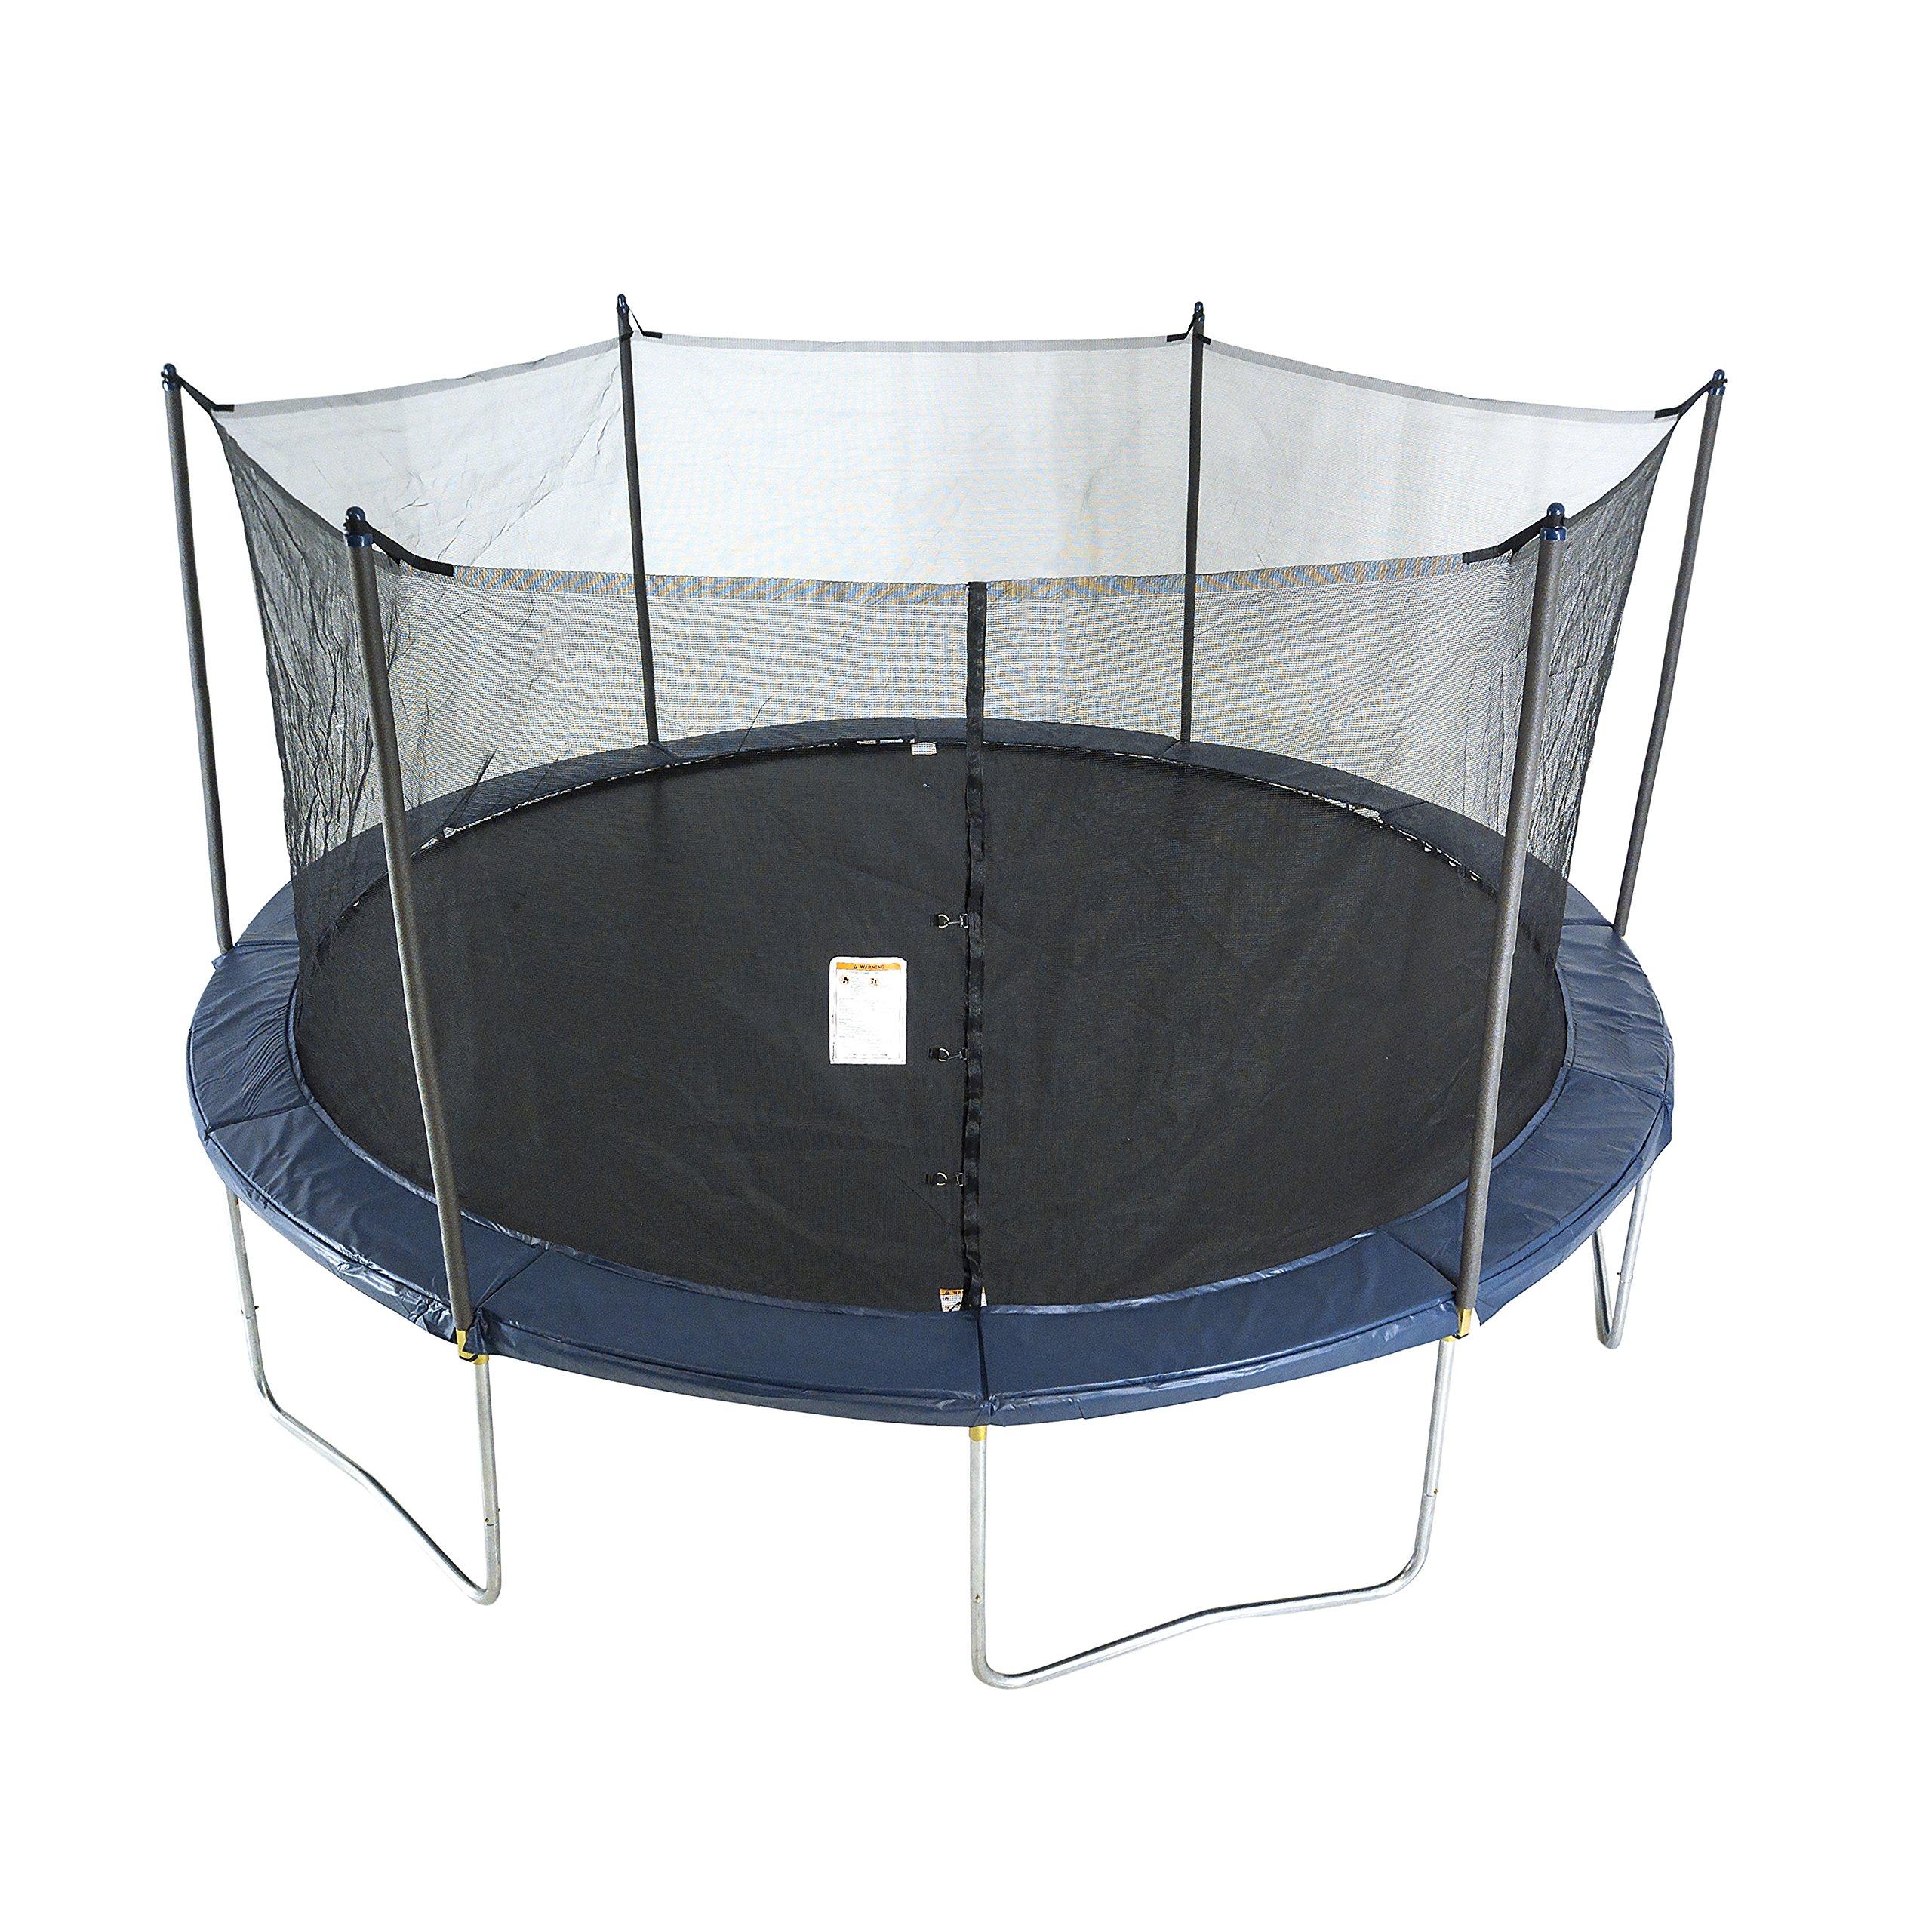 ActivPlay 16' Round Trampoline & Enclosure, Navy Blue by ActivPlay (Image #1)